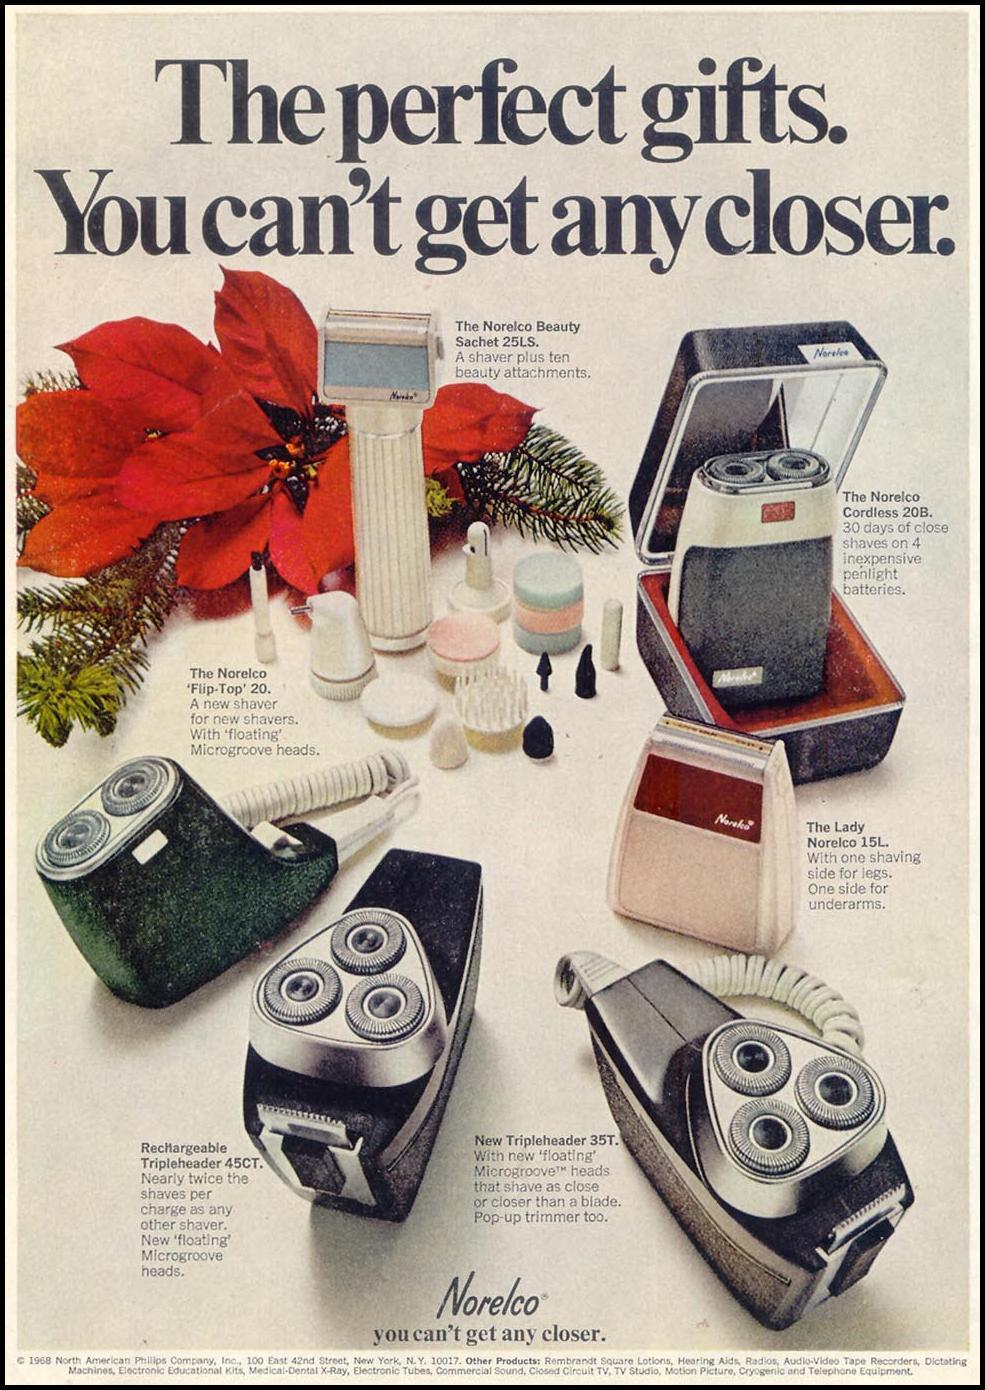 NORELCO ELECTRIC RAZORS SATURDAY EVENING POST 12/28/1968 p. 12